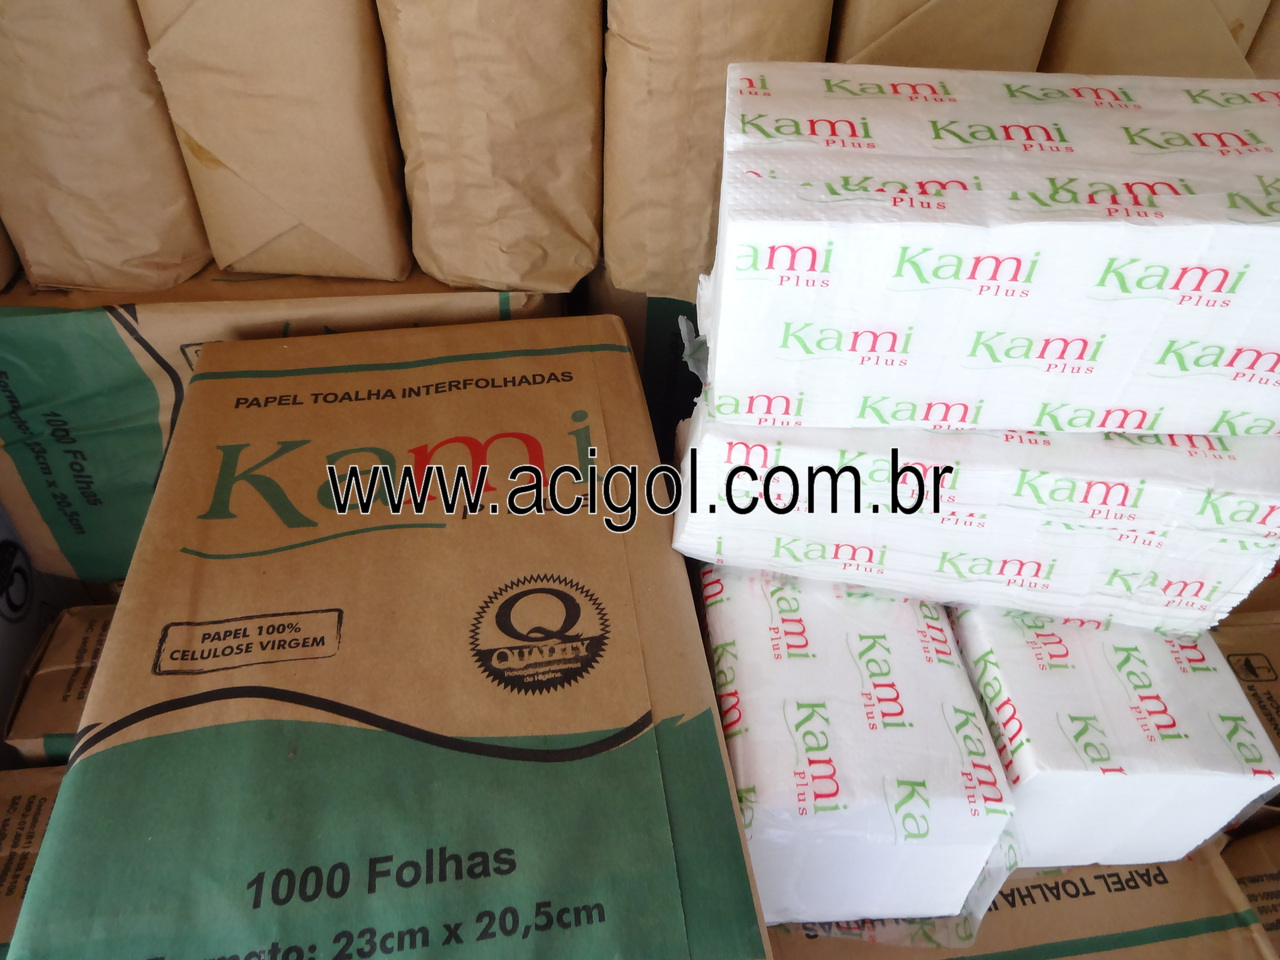 papel toalha kami fardo c1000fls-foto acigol 81 34451782-DSC00367